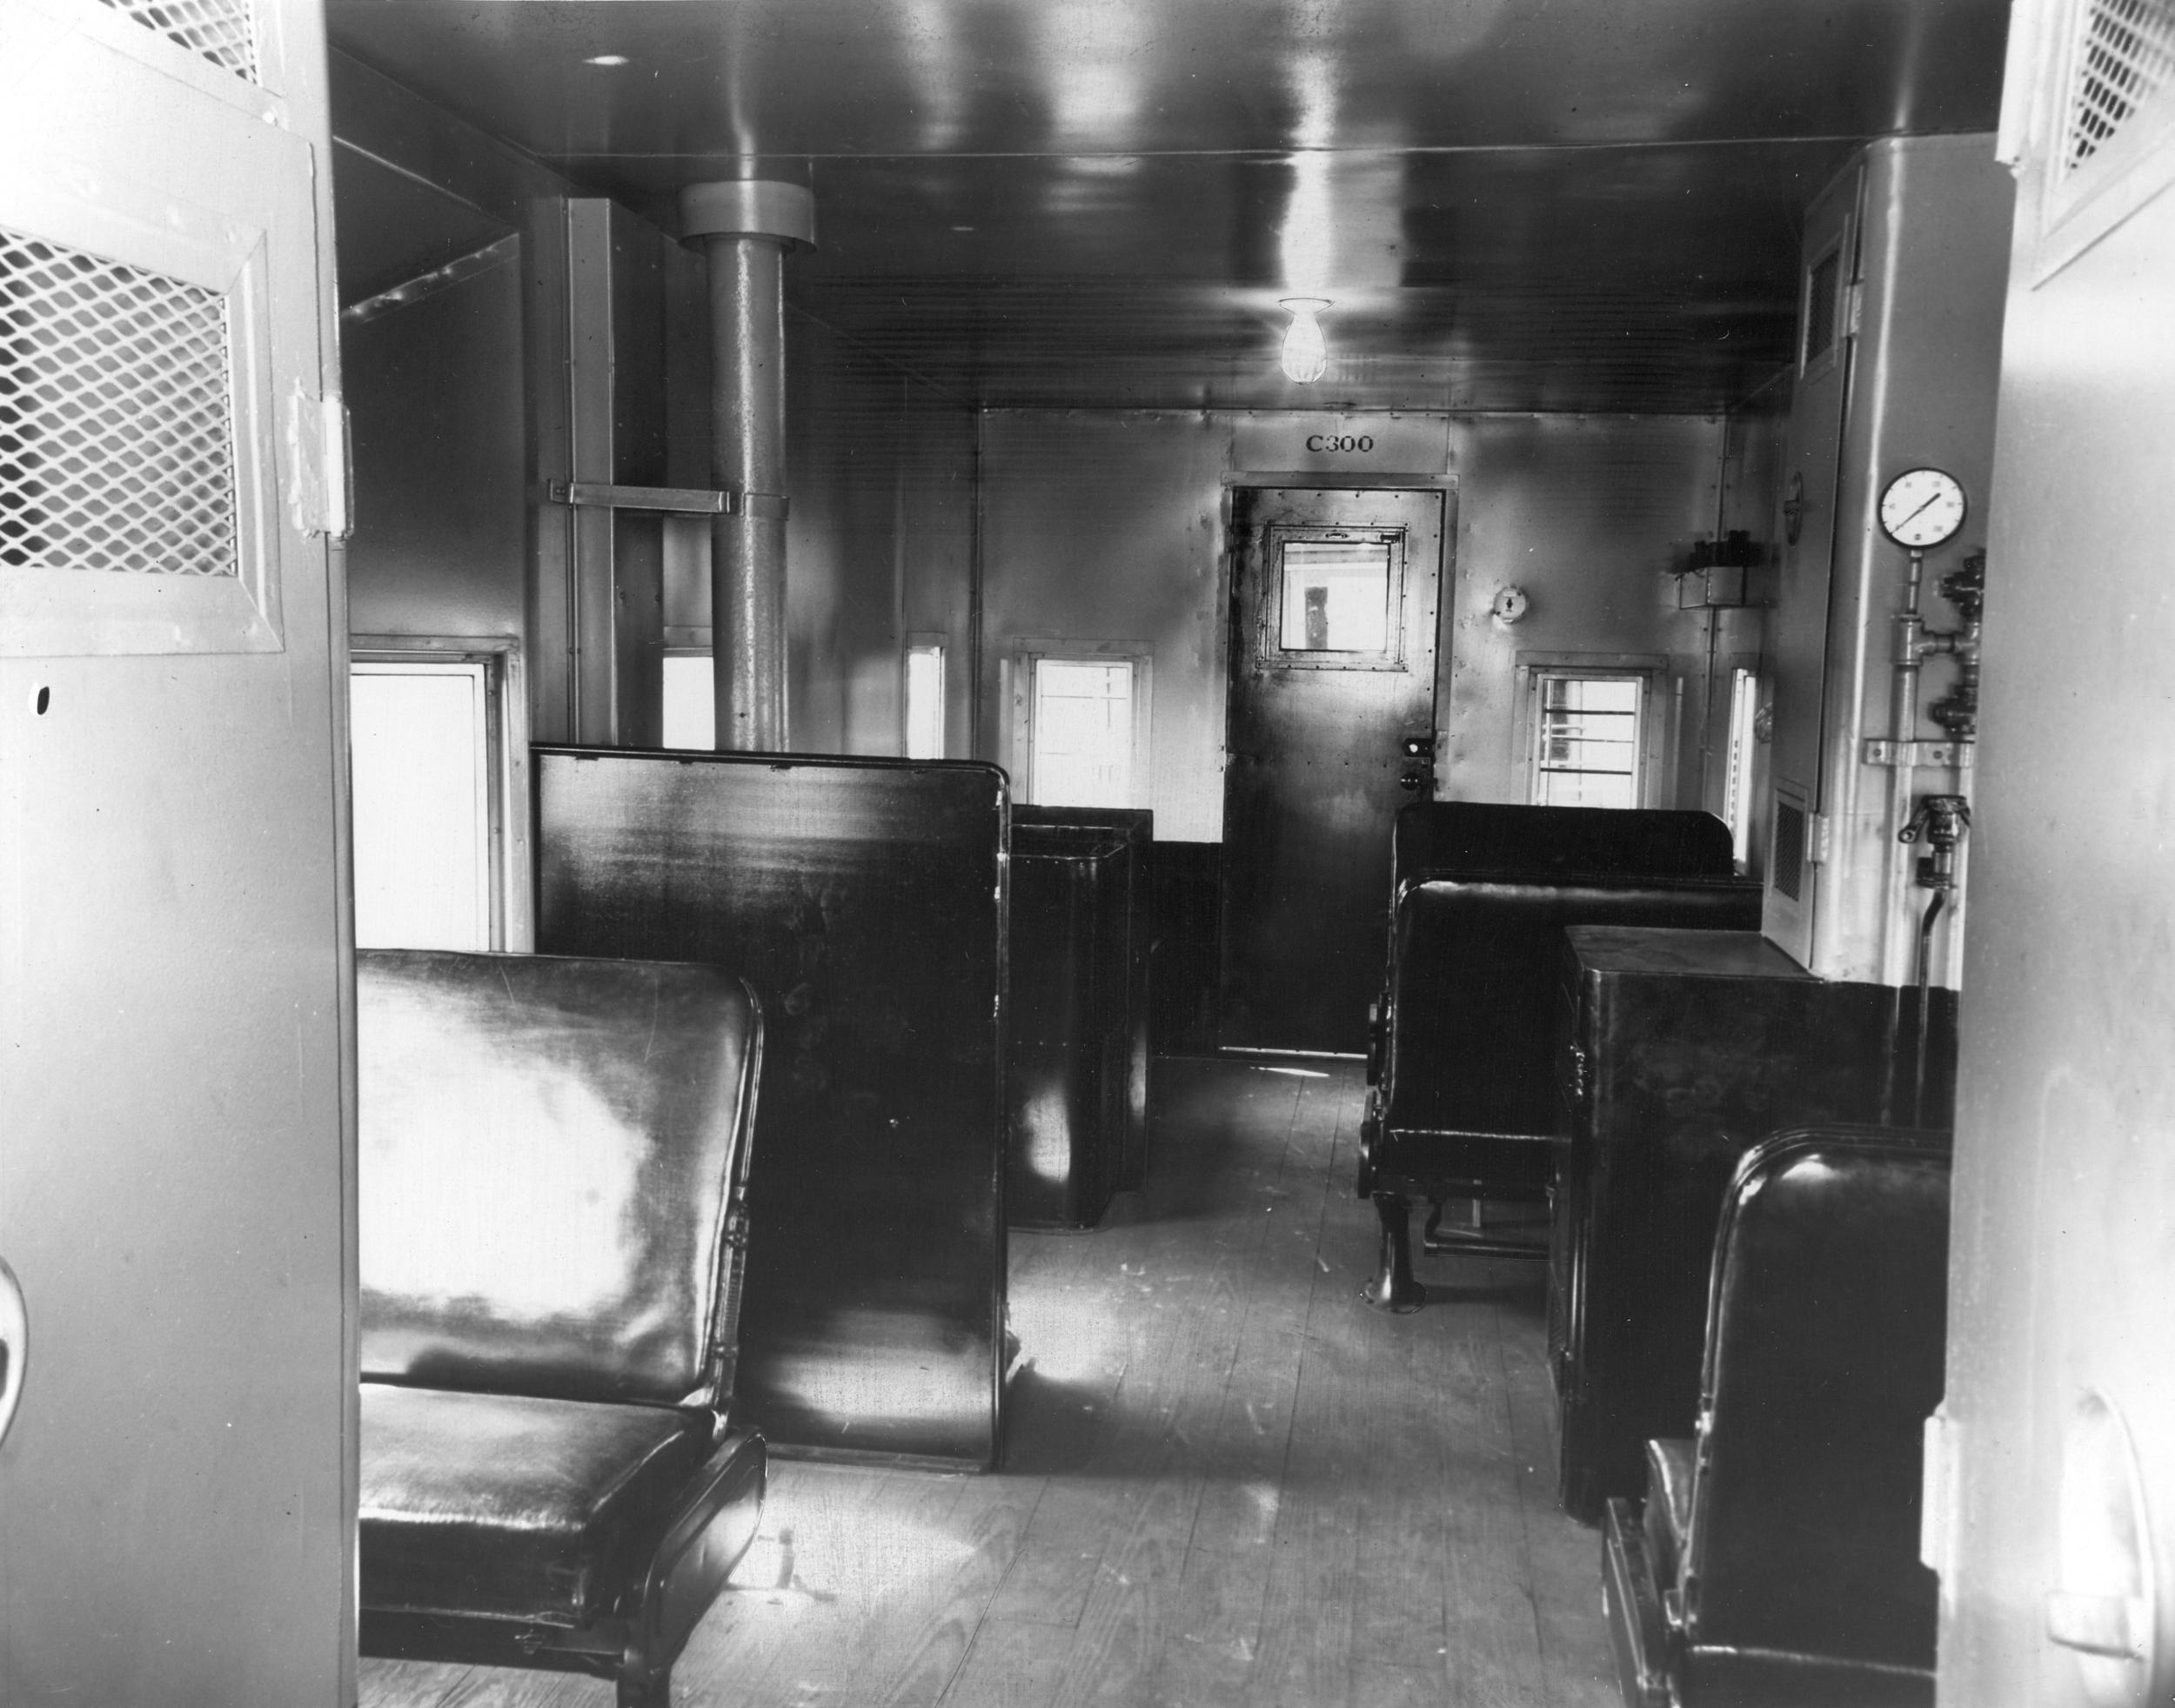 1952 interior photo of prototype caboose No. C300.  (Erie Railroad photo)